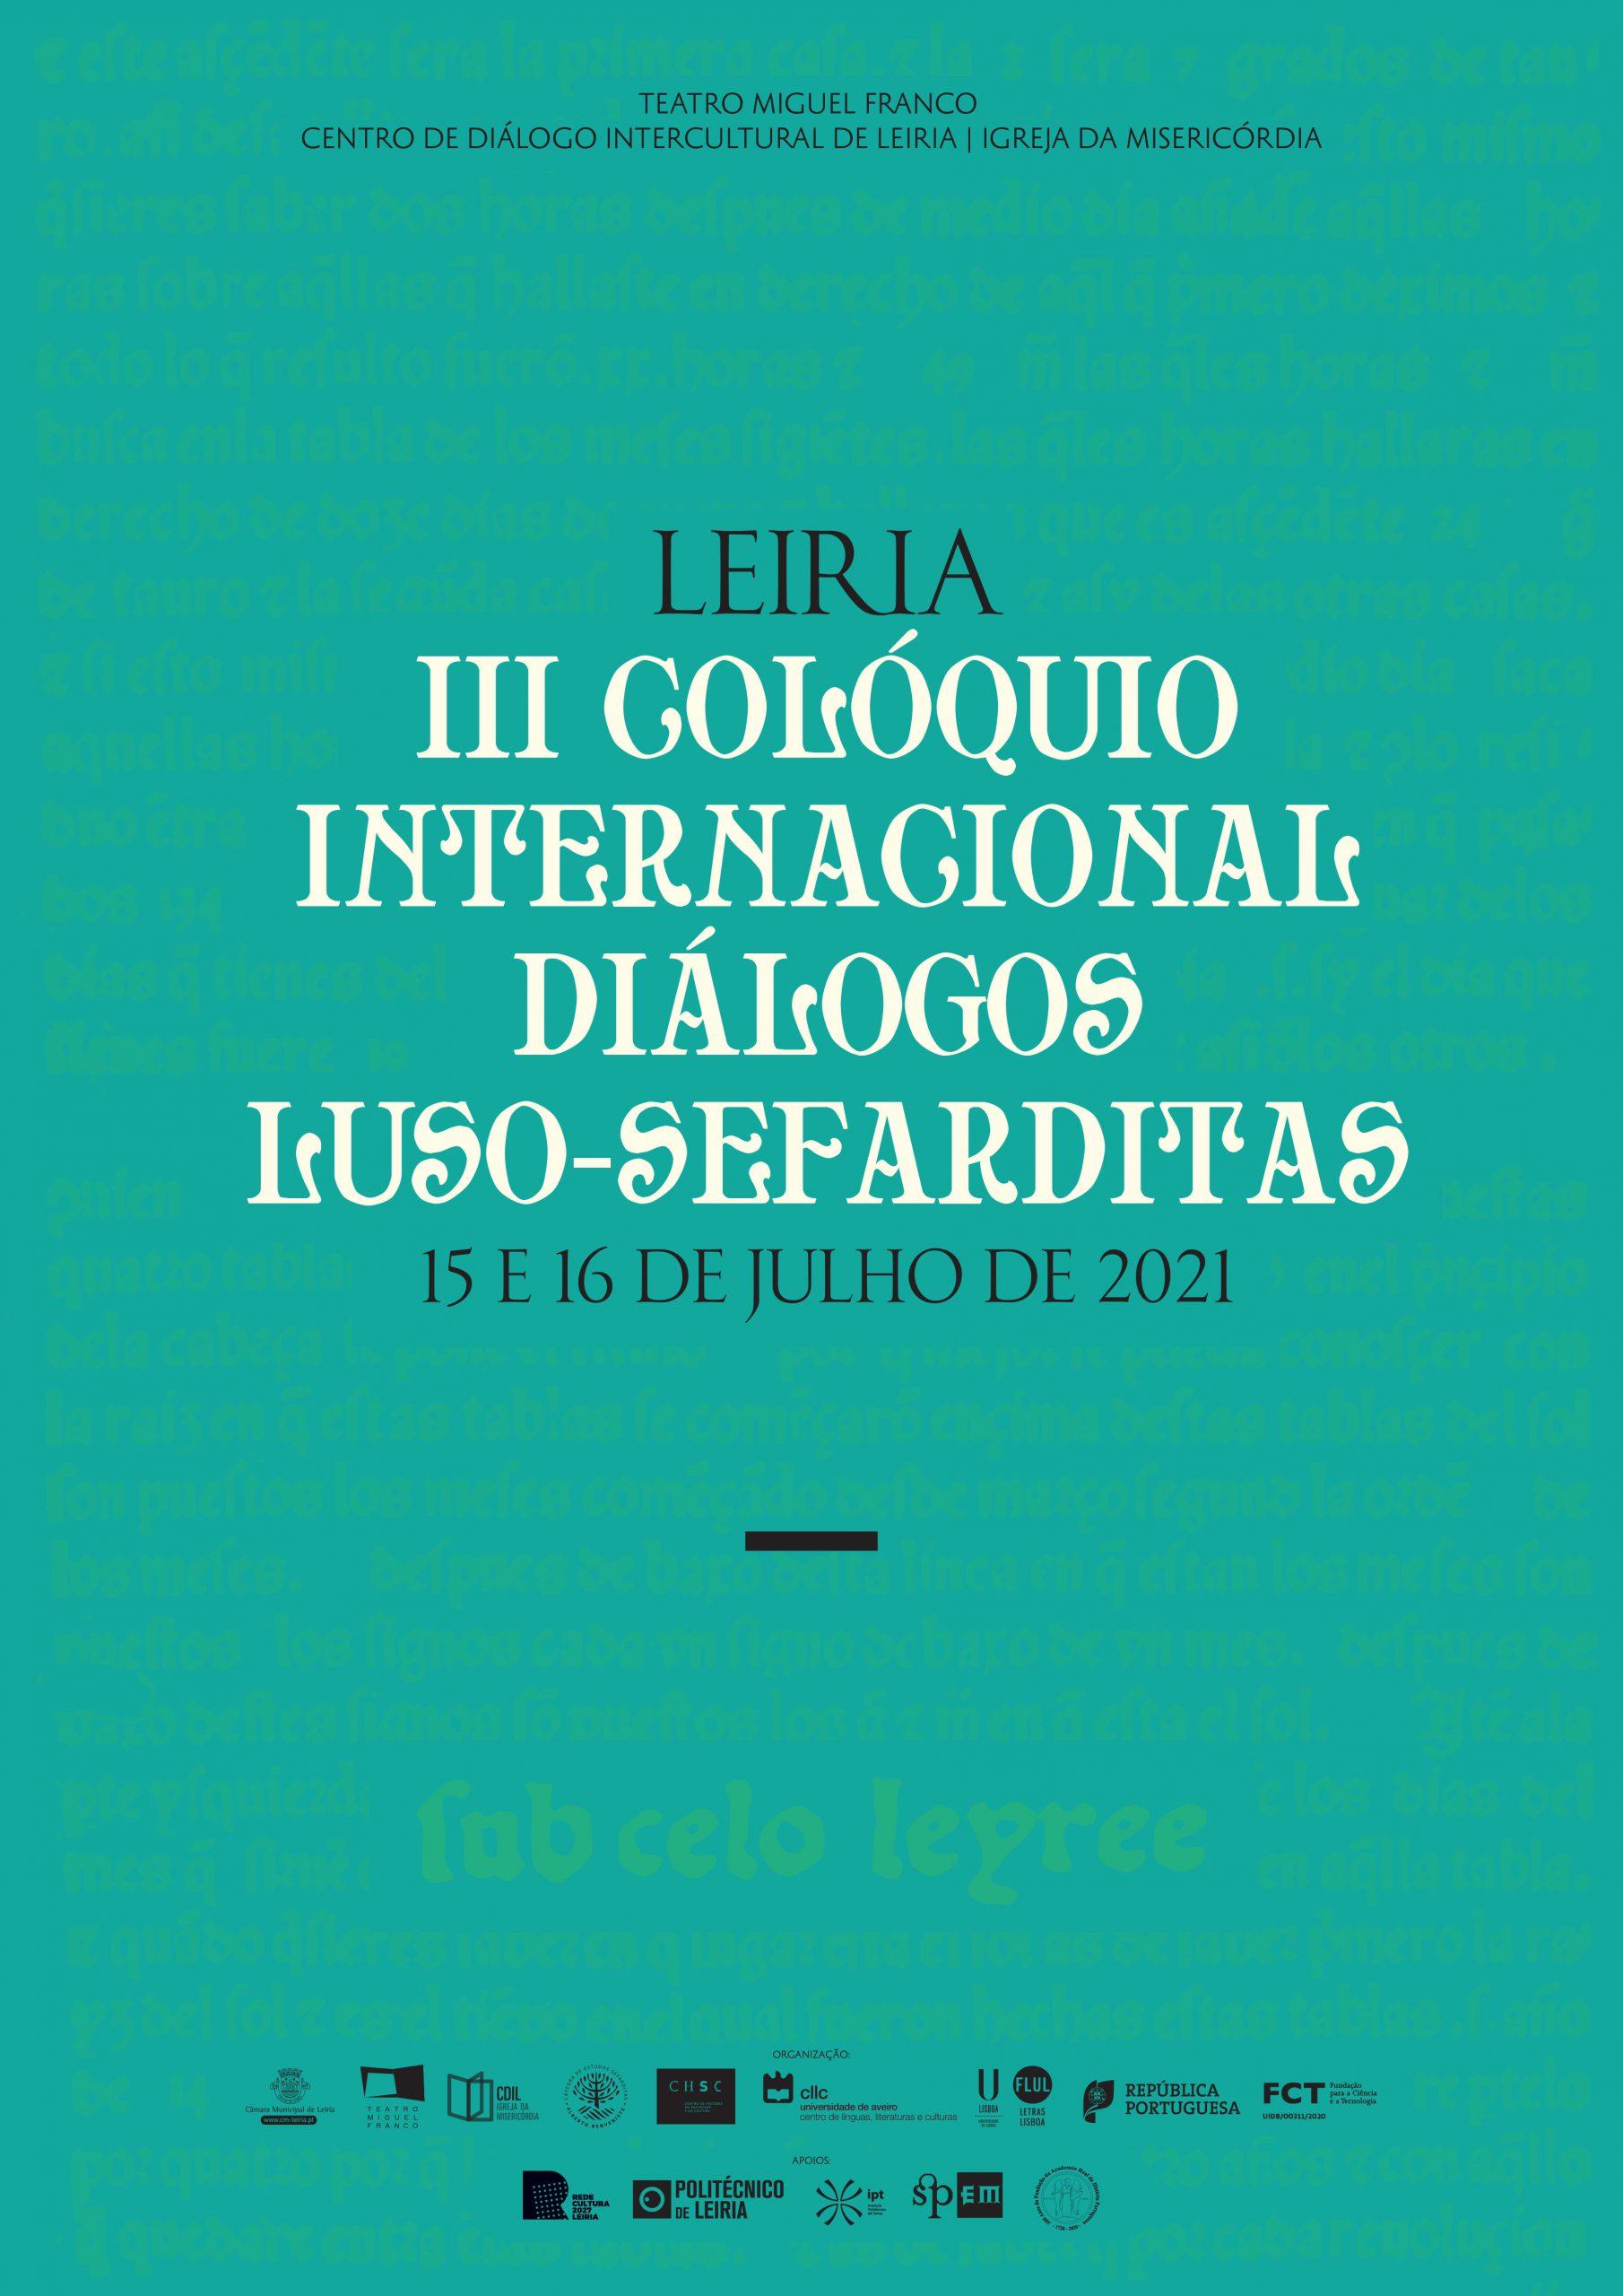 III Colóquio Internacional – Diálogos Luso-sefarditas